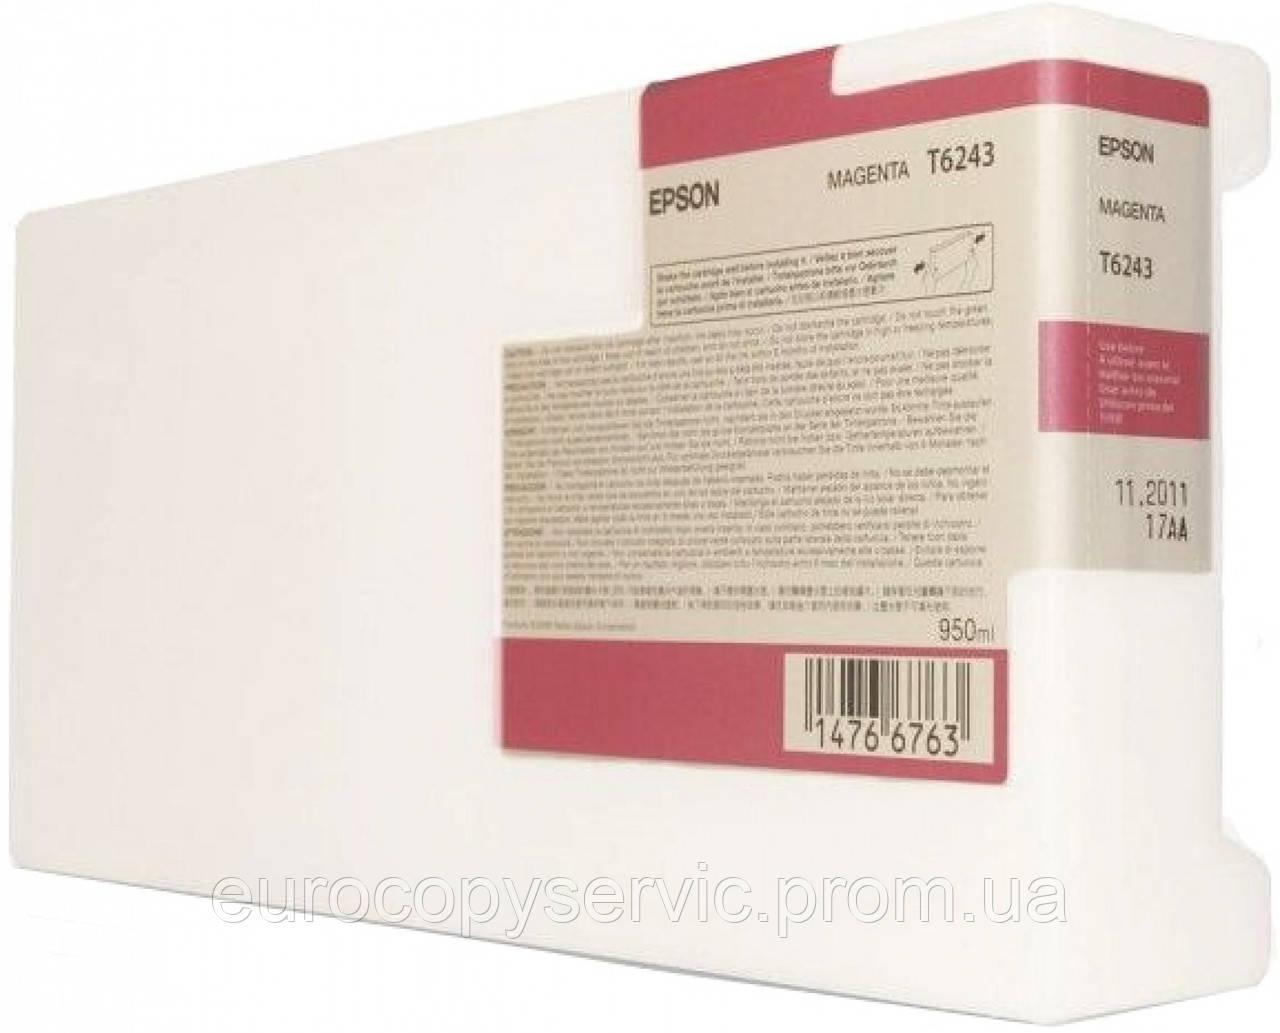 Картридж Epson SP-GS6000 Magenta (C13T624300) Original